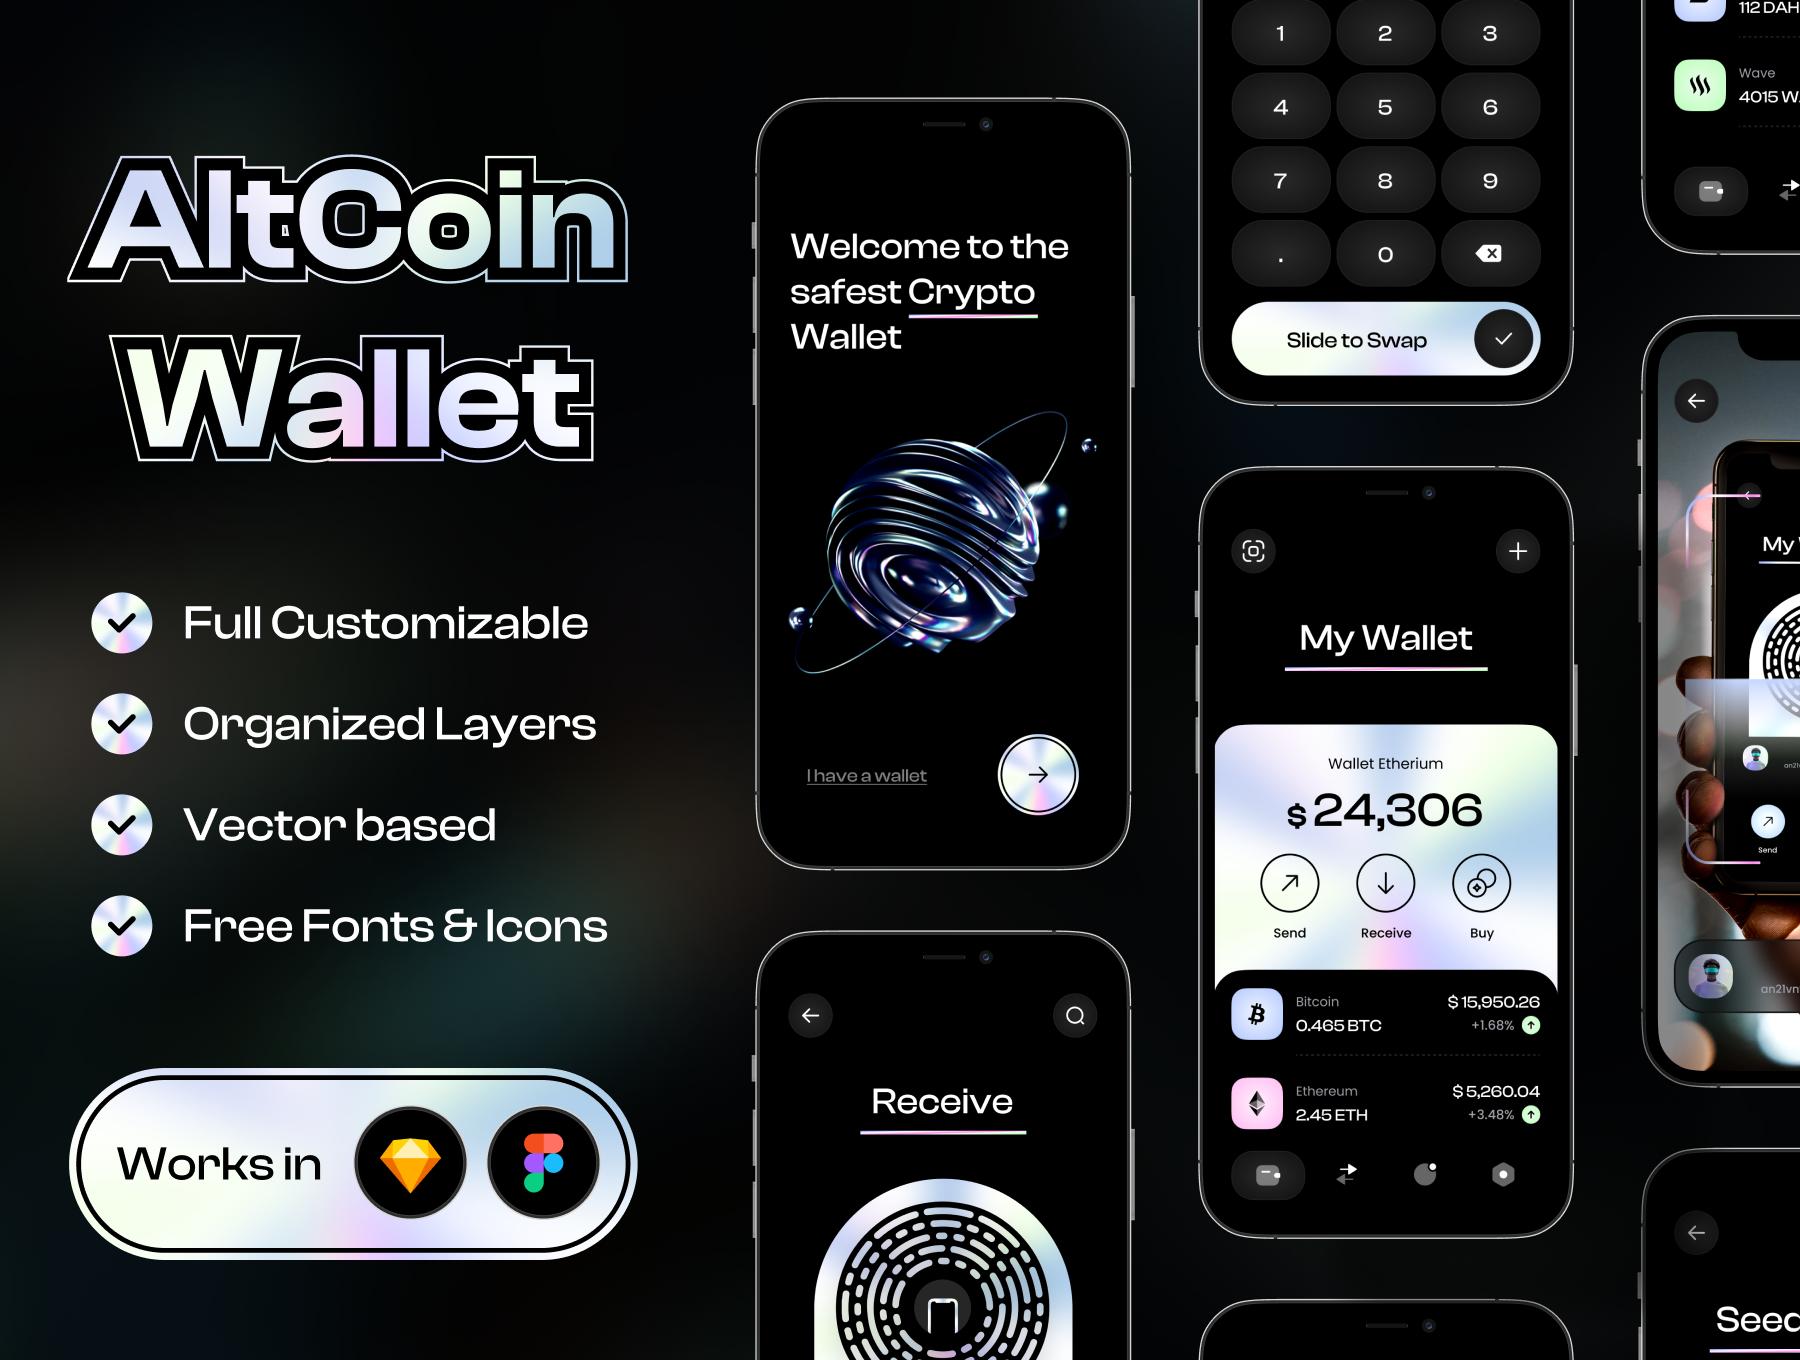 [VIP] Crypto Wallet UI Kit AltCoin Wallet